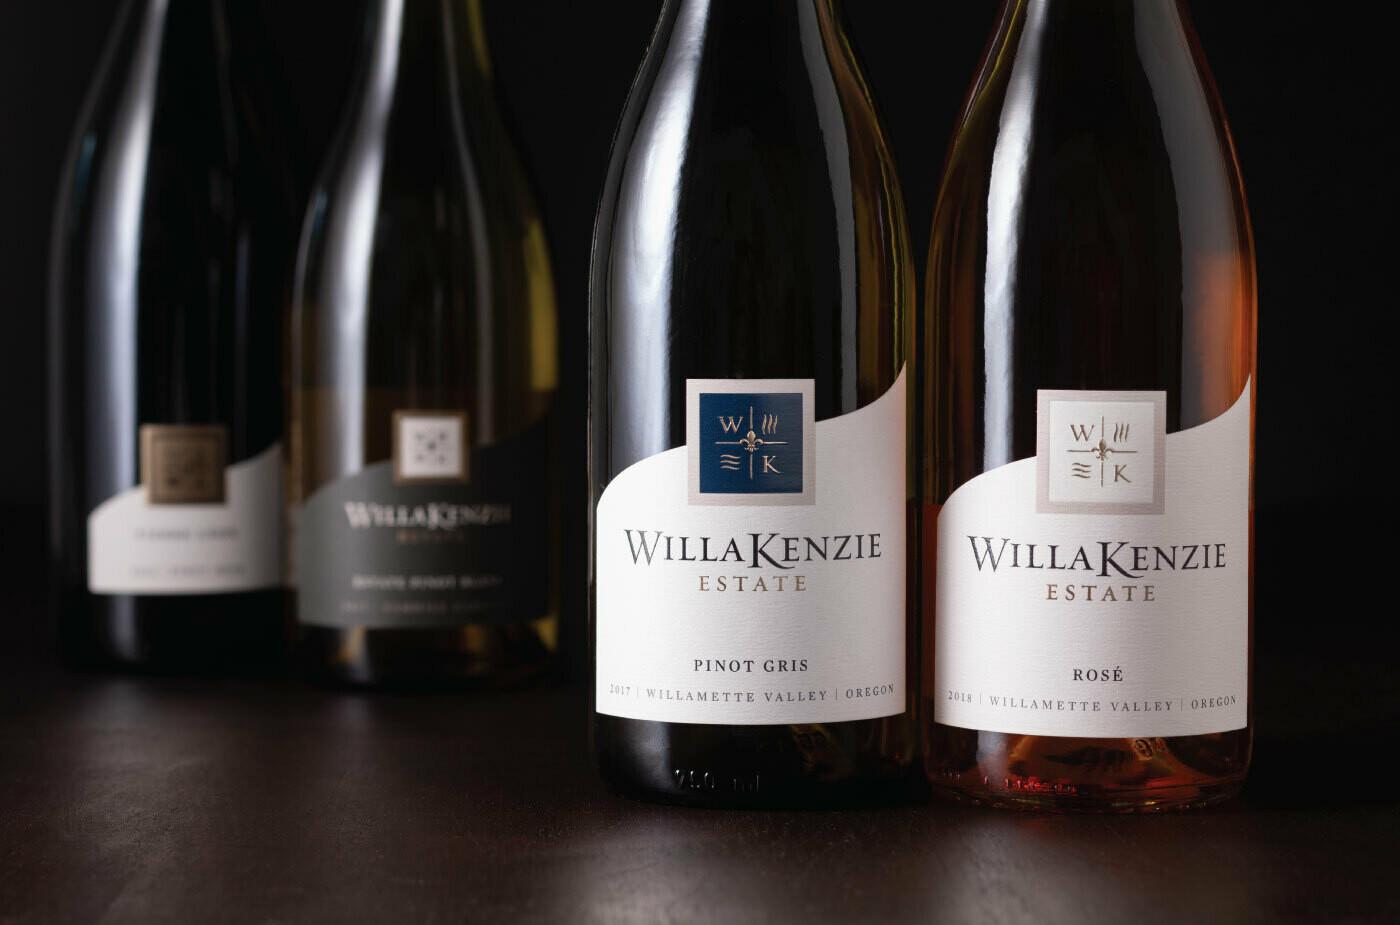 National Oregon Wine Month - WillaKenzie Estate Wine Tasting - 5/7/21